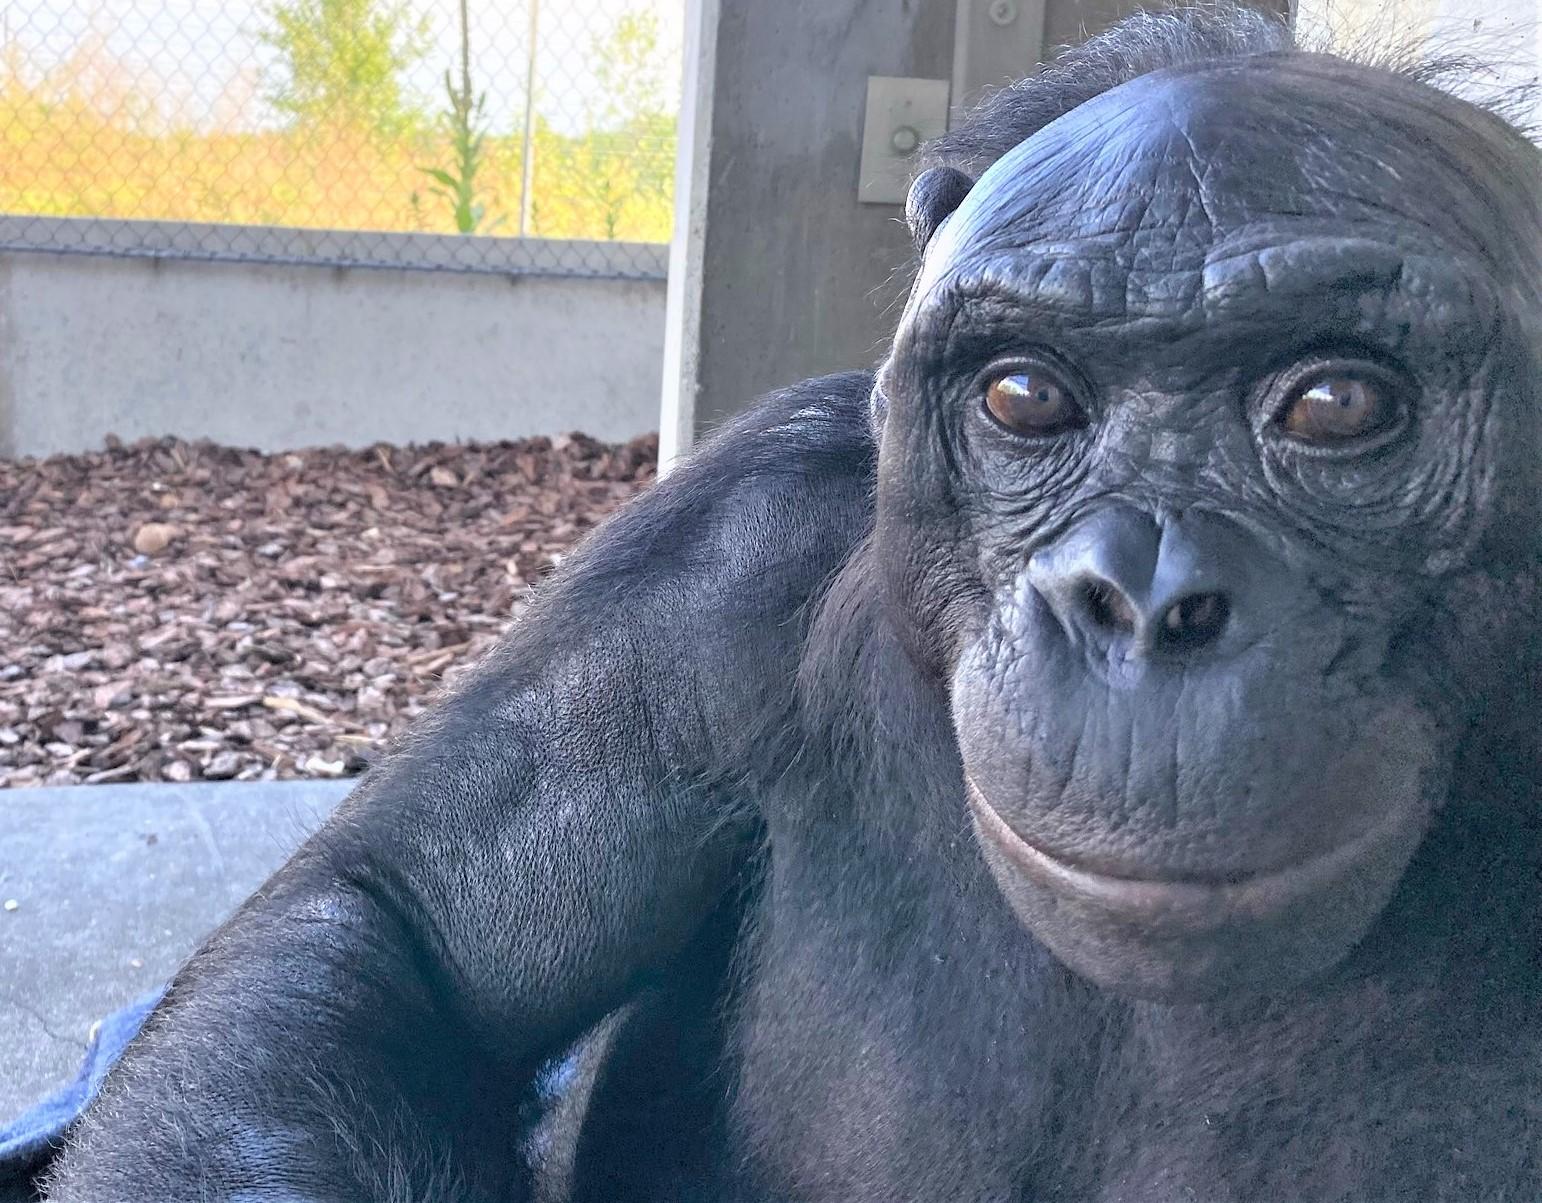 Kanzi, the world's most famous bonobo, turns 40